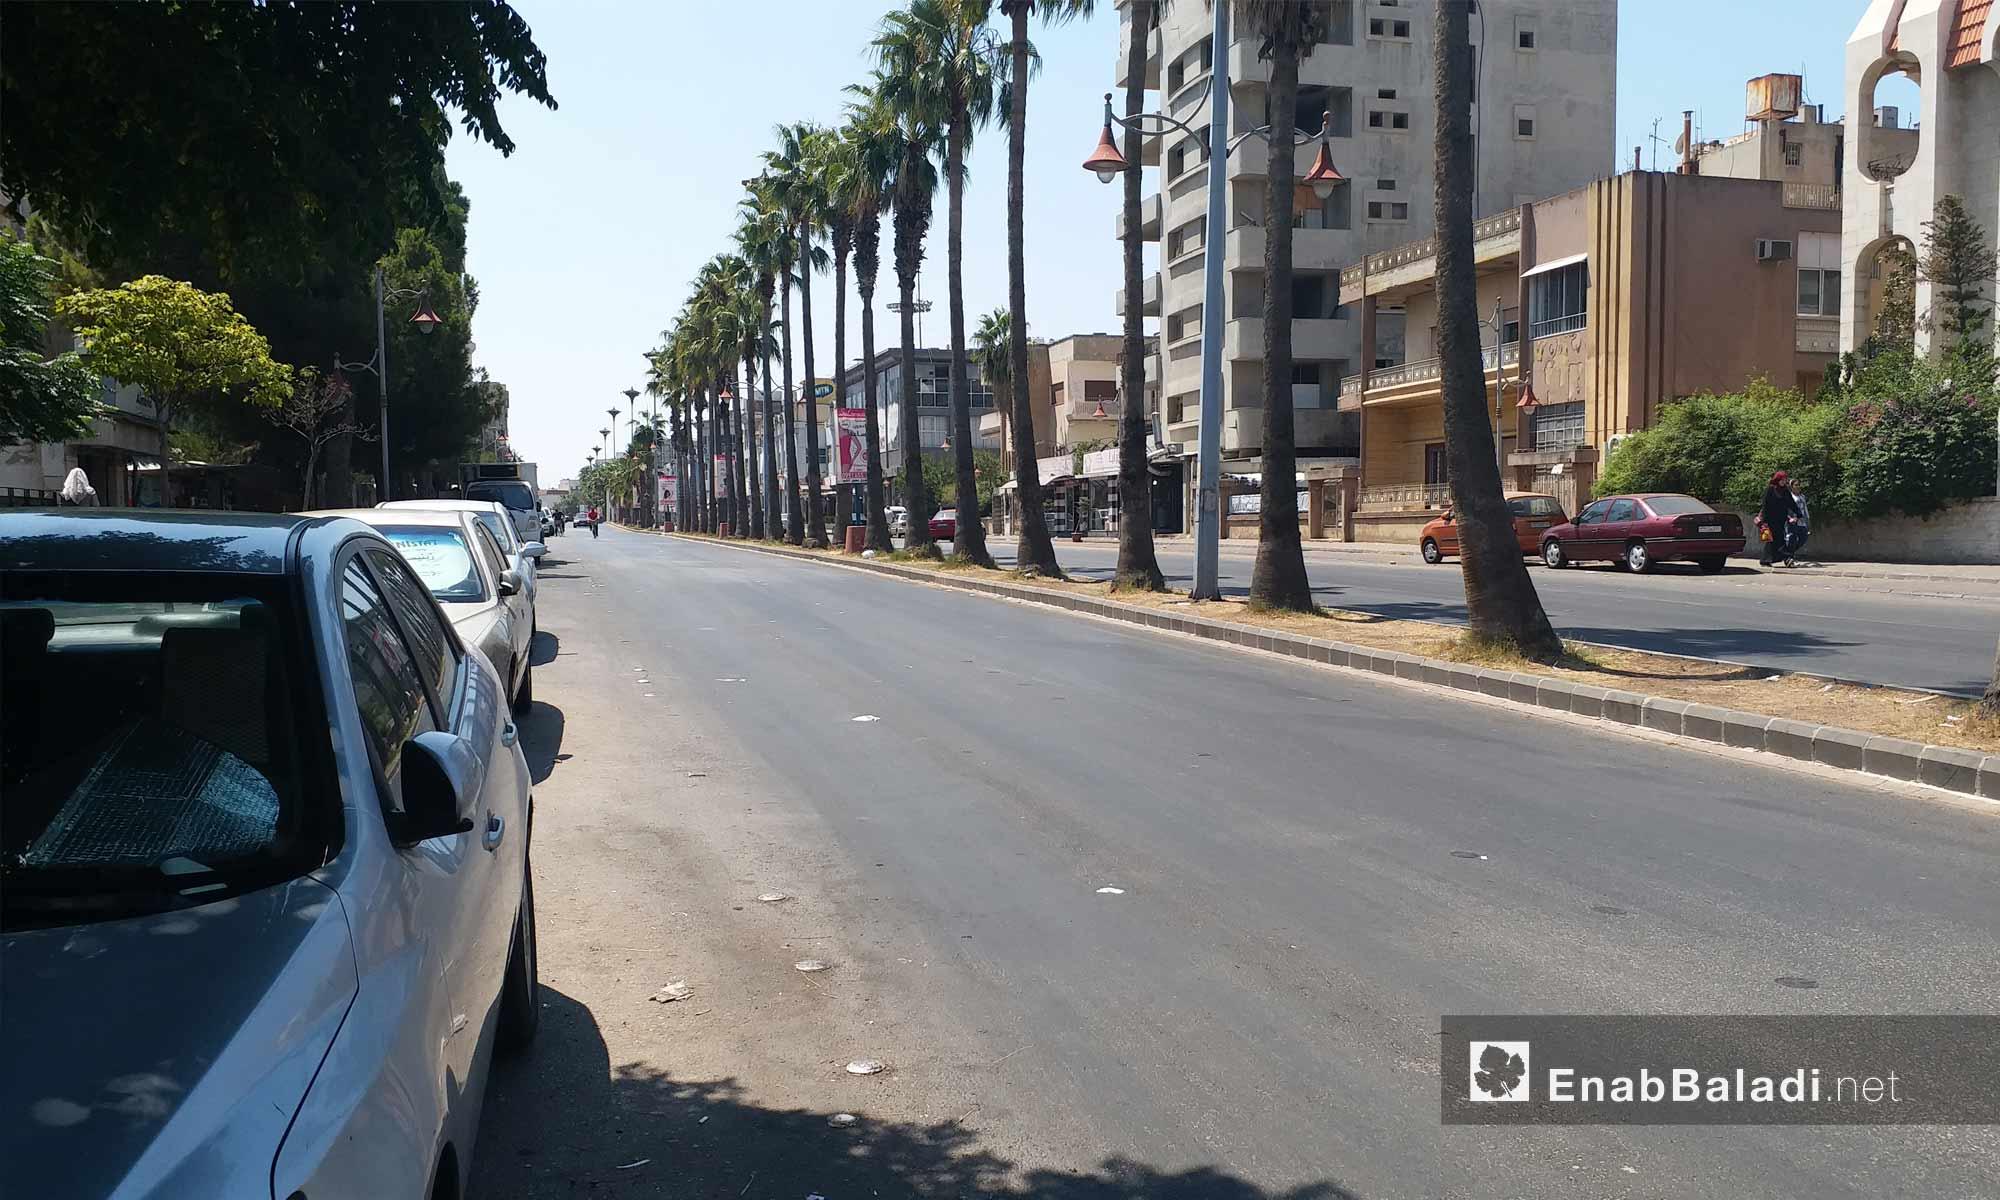 Brazil street, Homs city - August 19, 2018 (Enab Baladi)